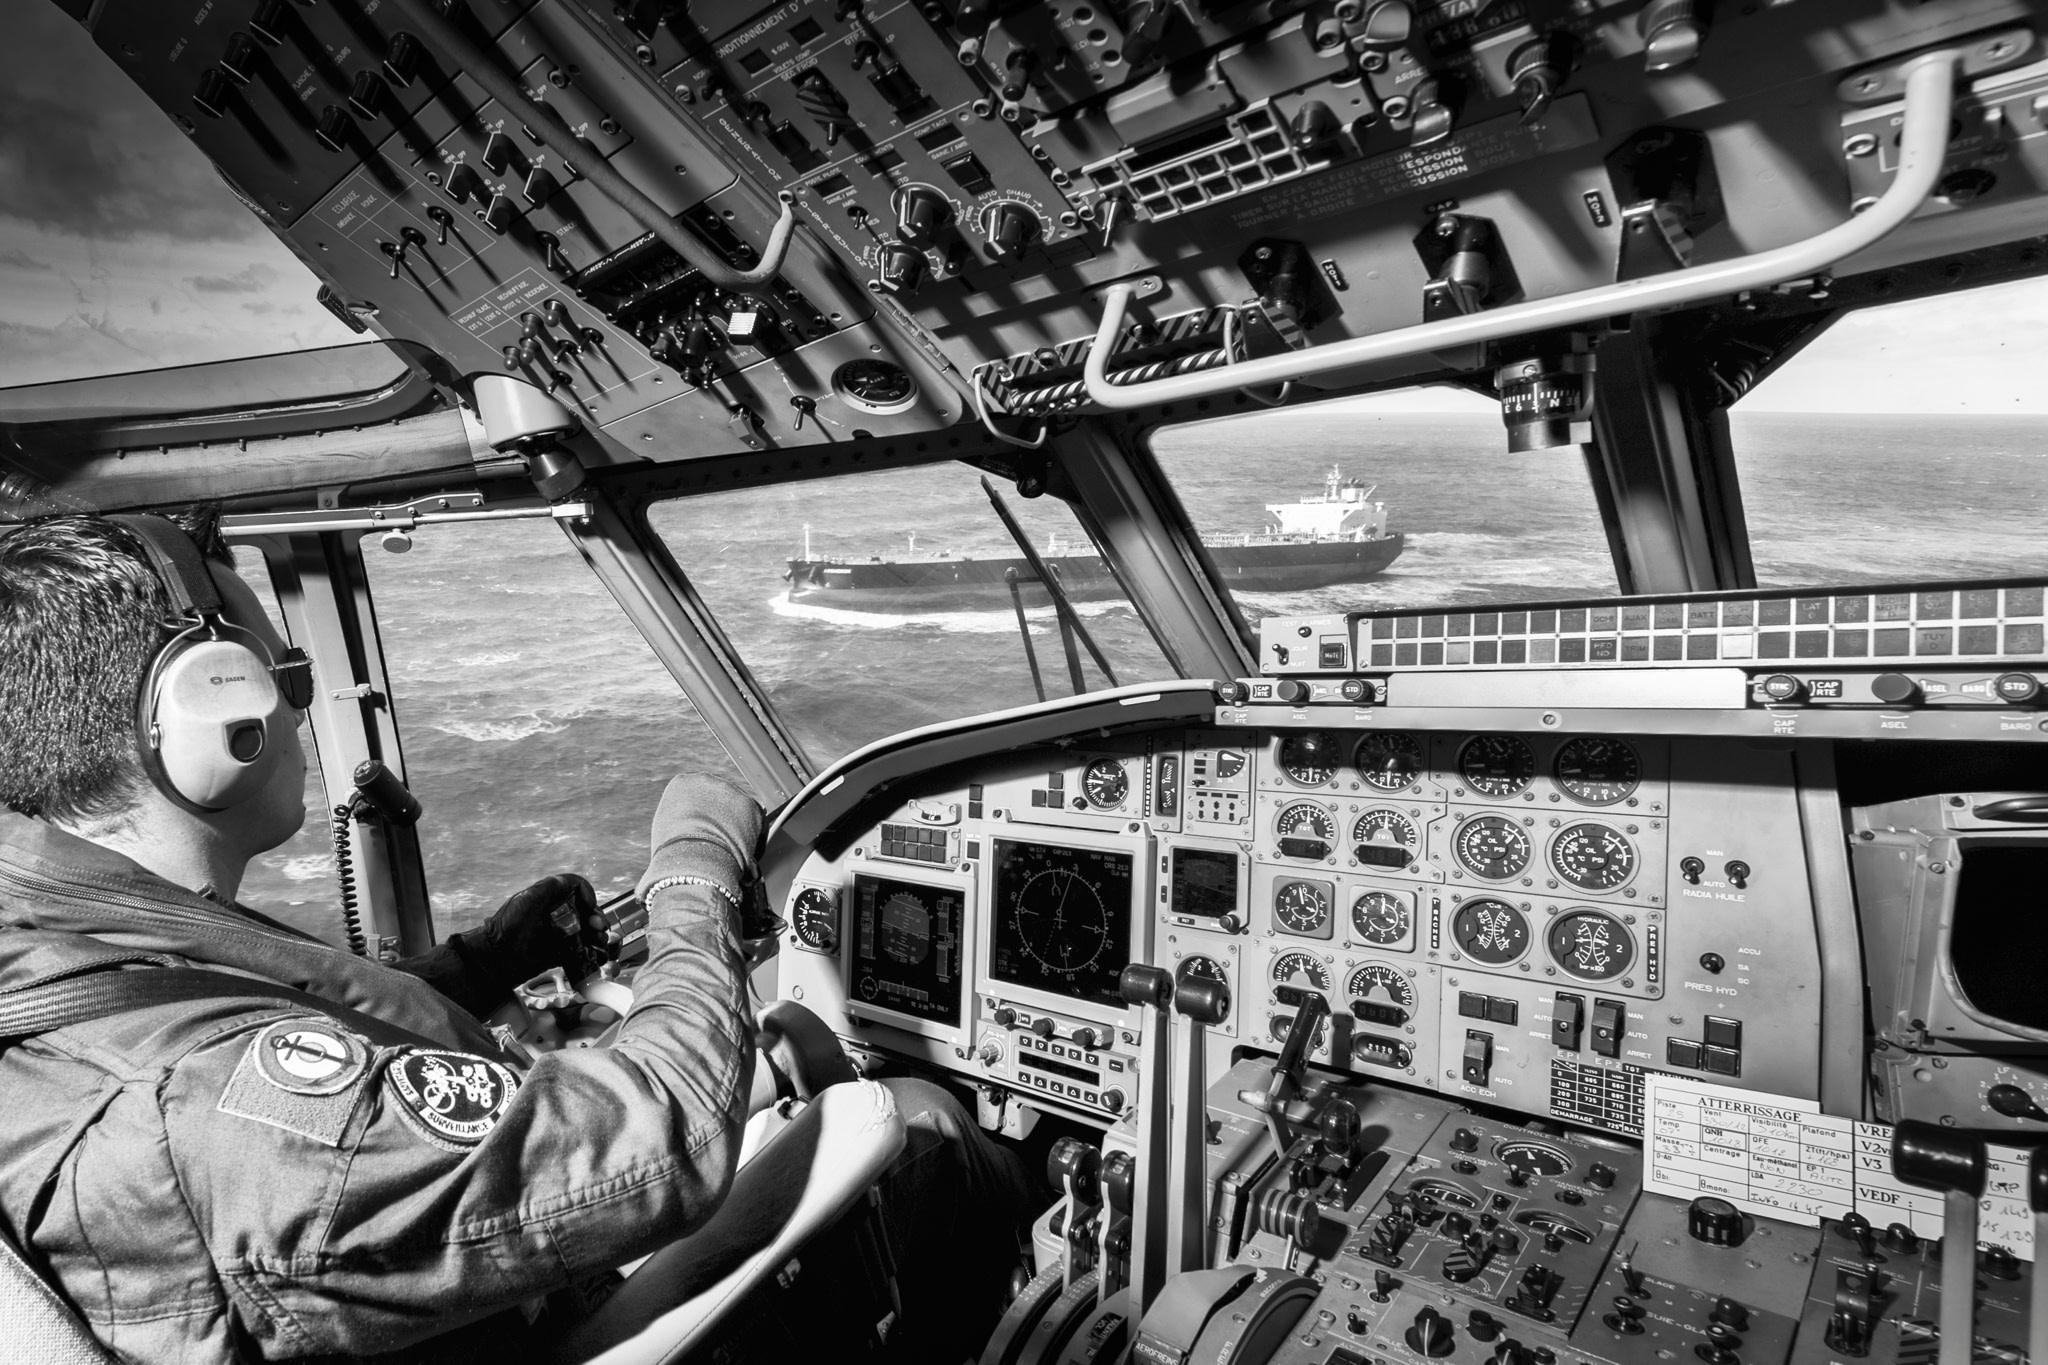 Photographie pilote avion ND59653